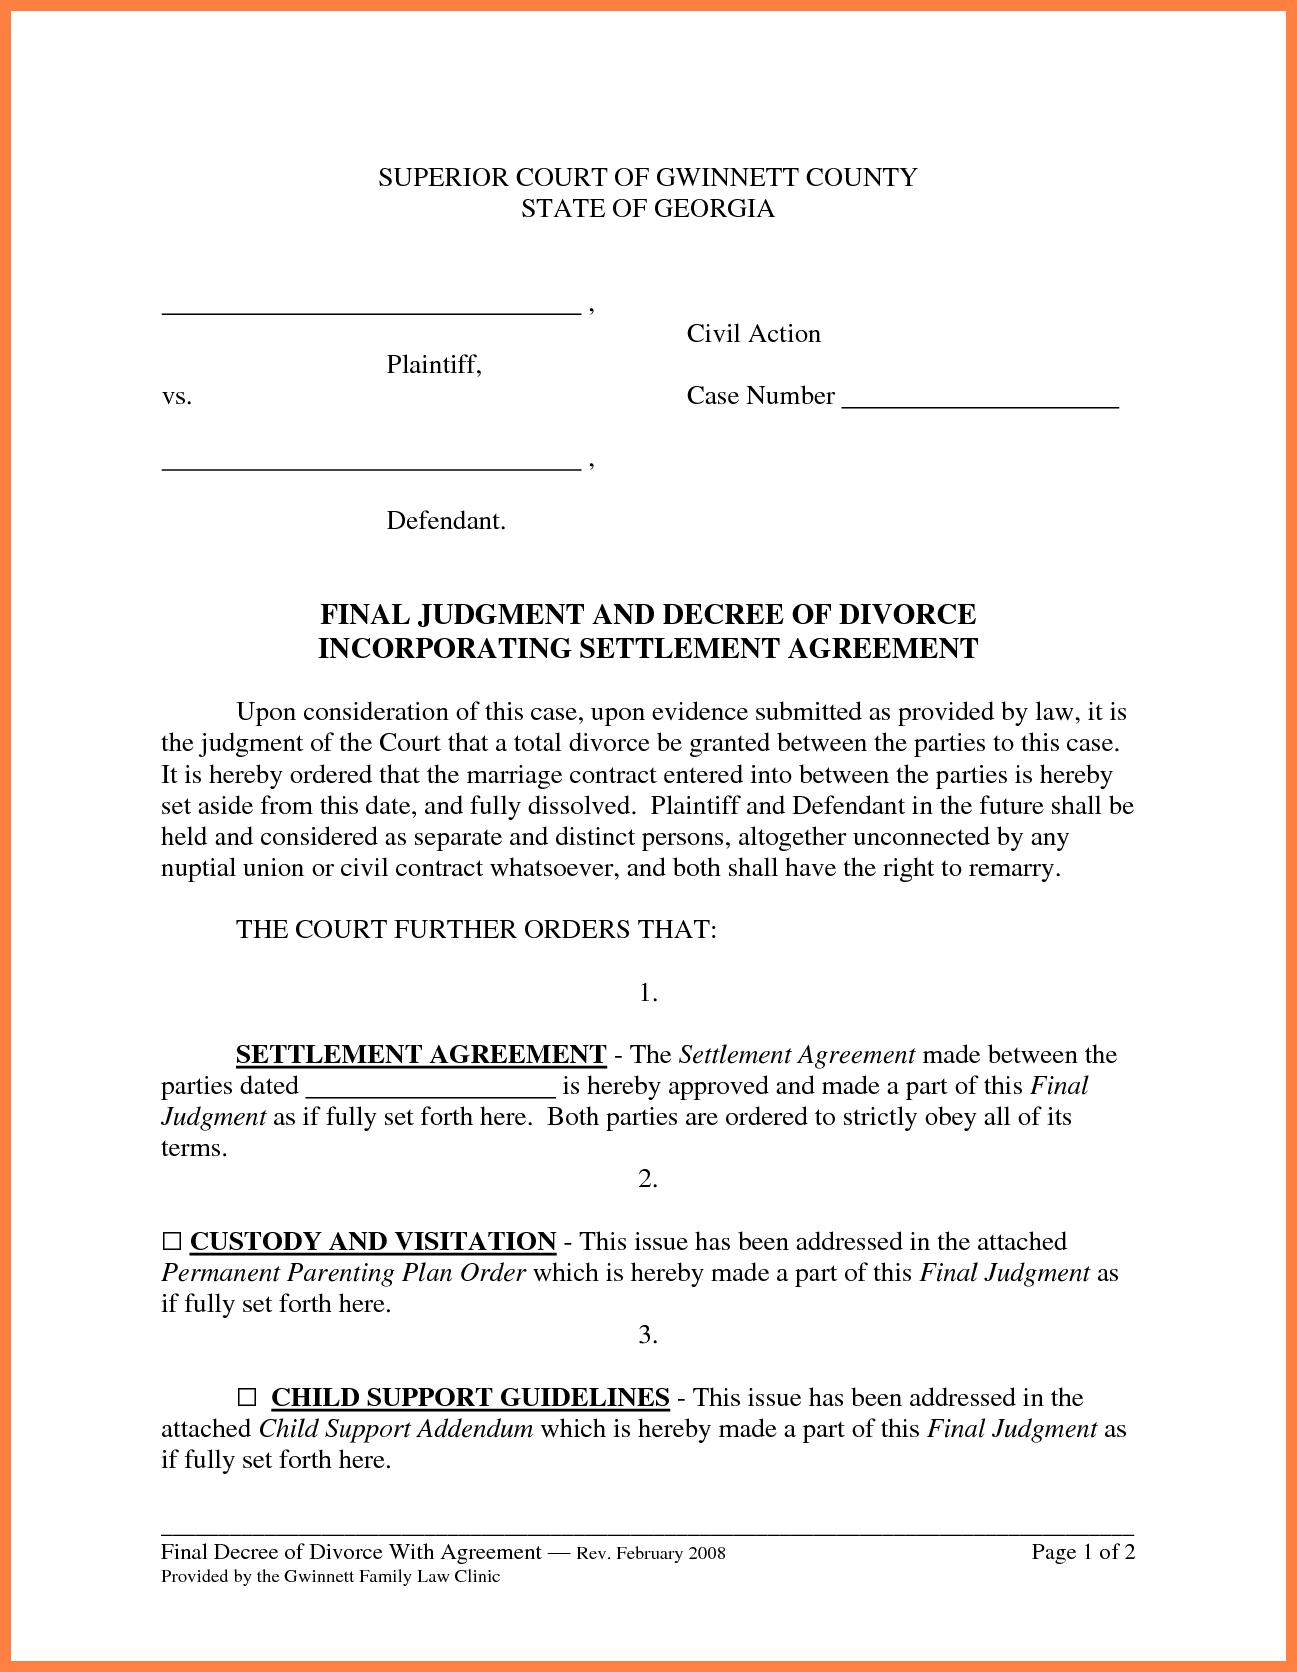 Marital Settlement Agreement  Marital Settlements Information For Divorce Mediation Agreement Template